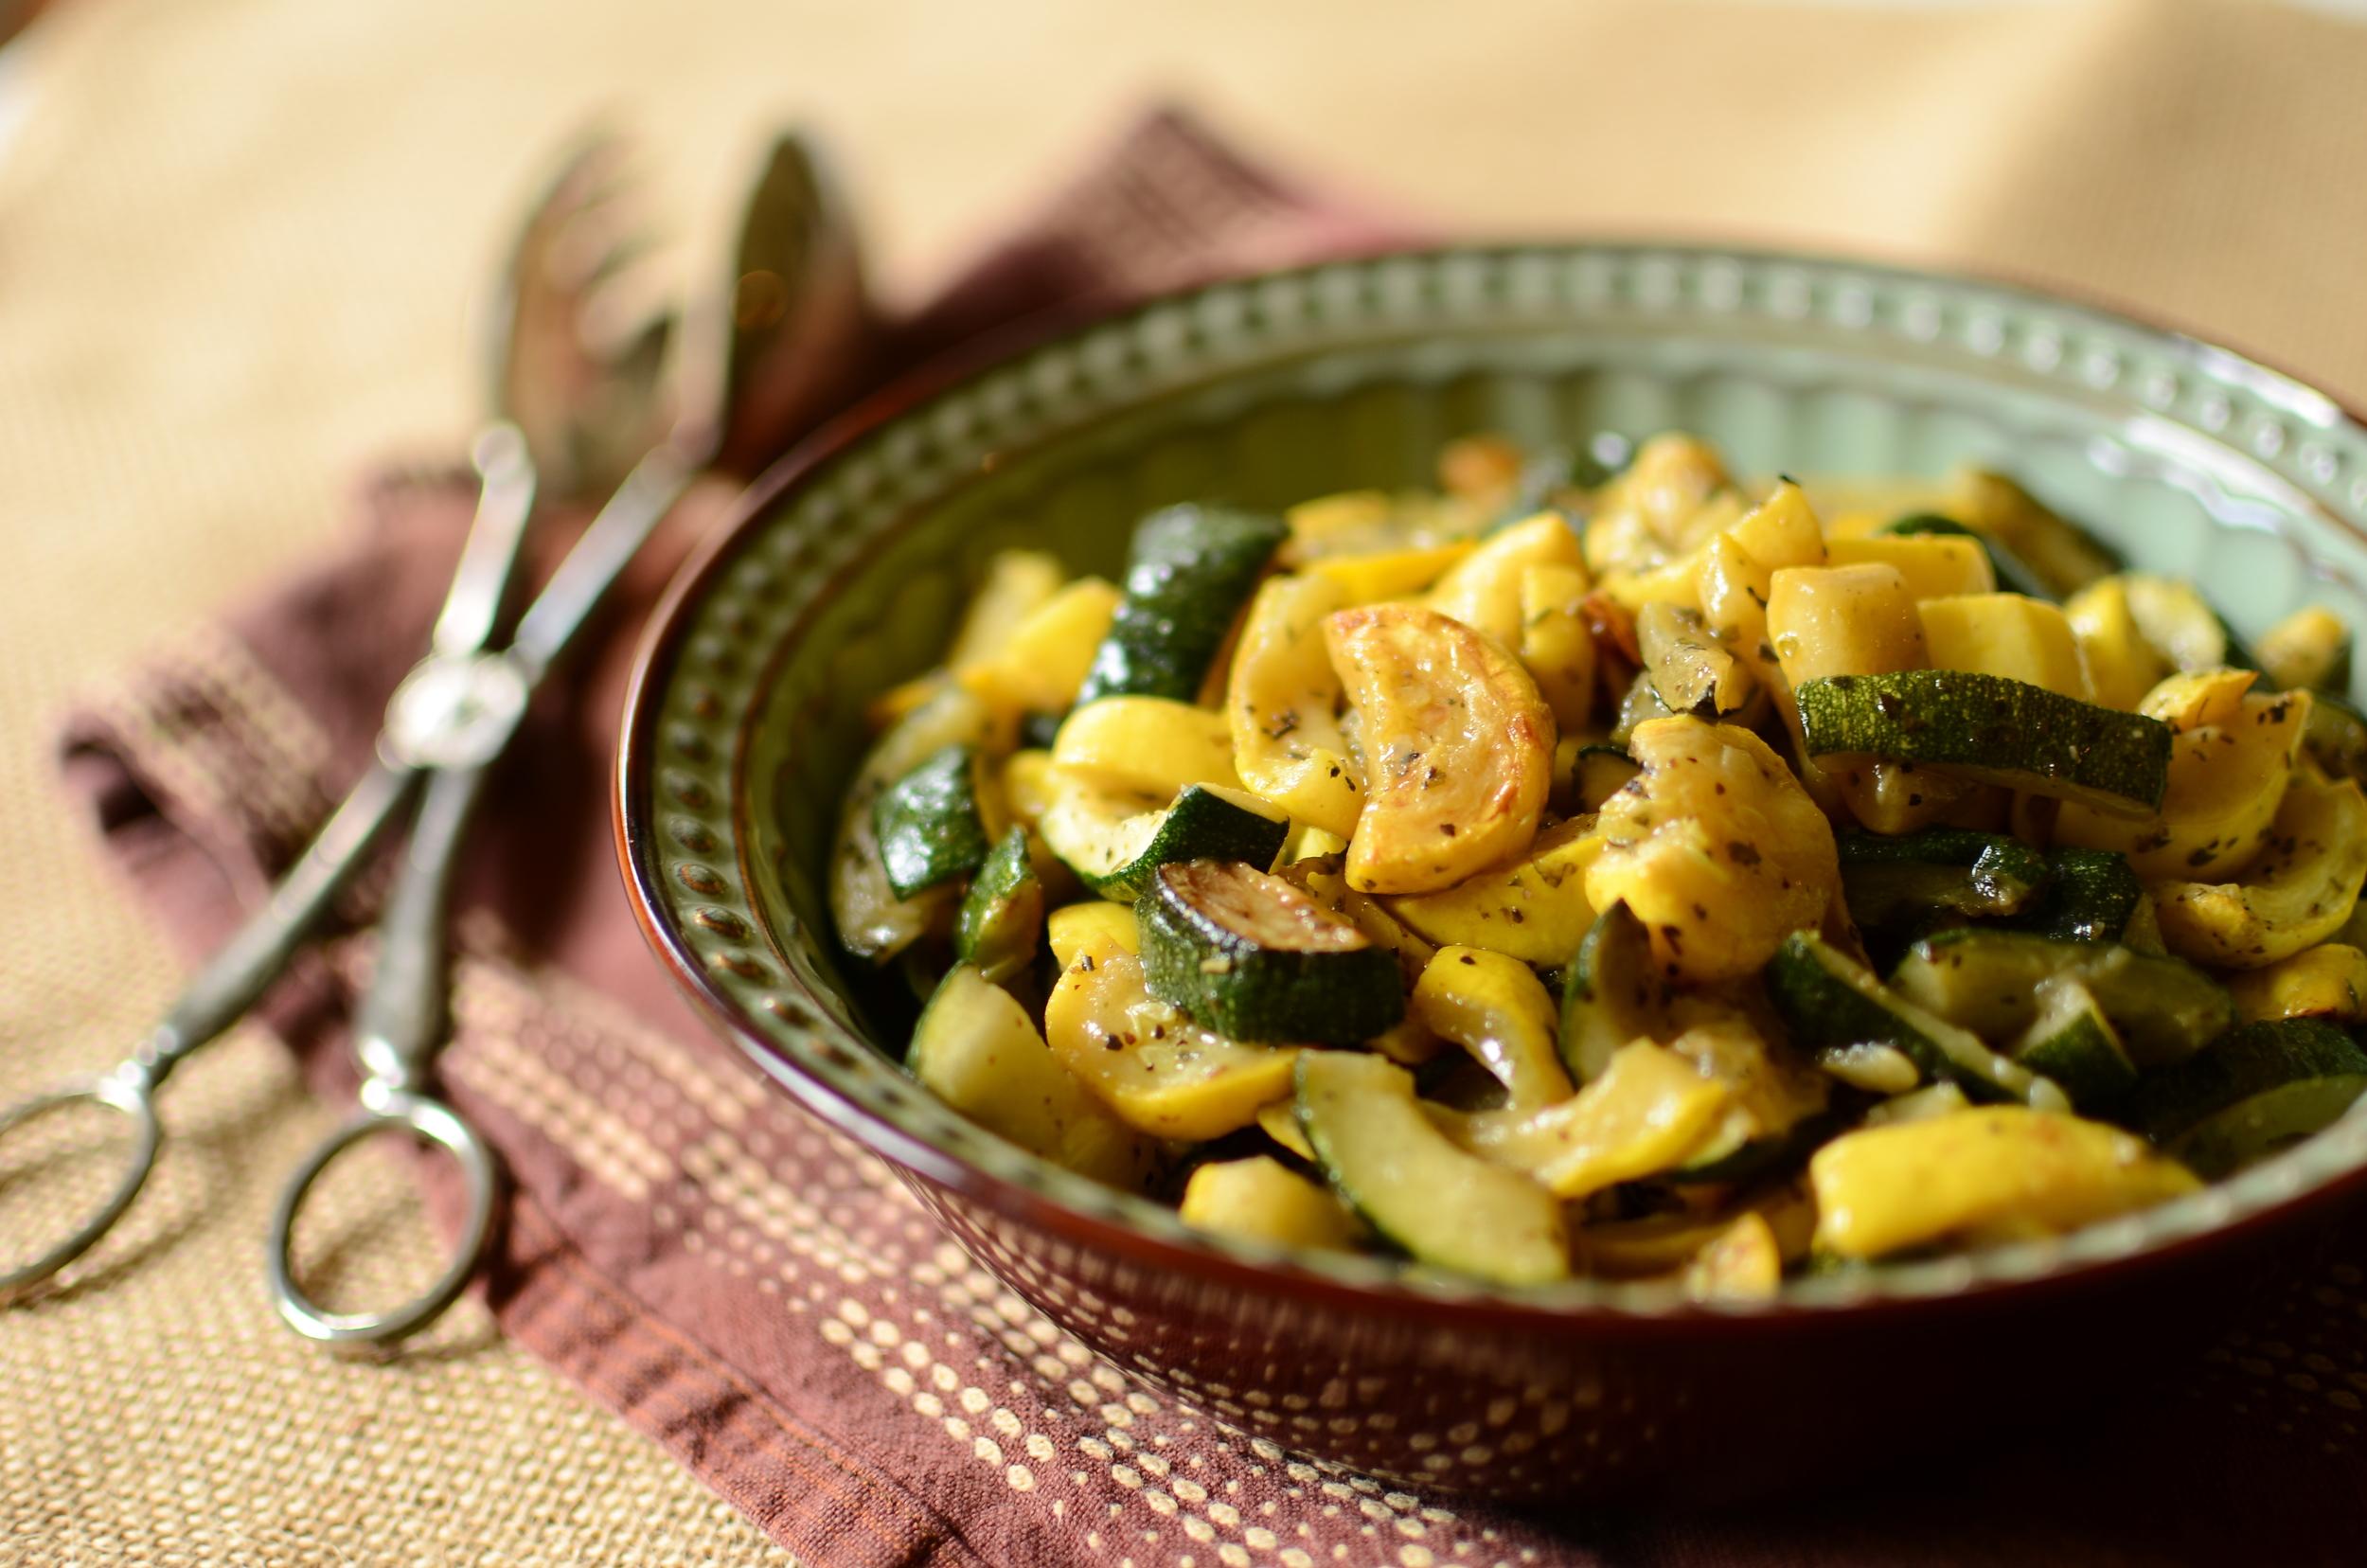 Sauteed Zucchini and Summer Squash - ButterYum